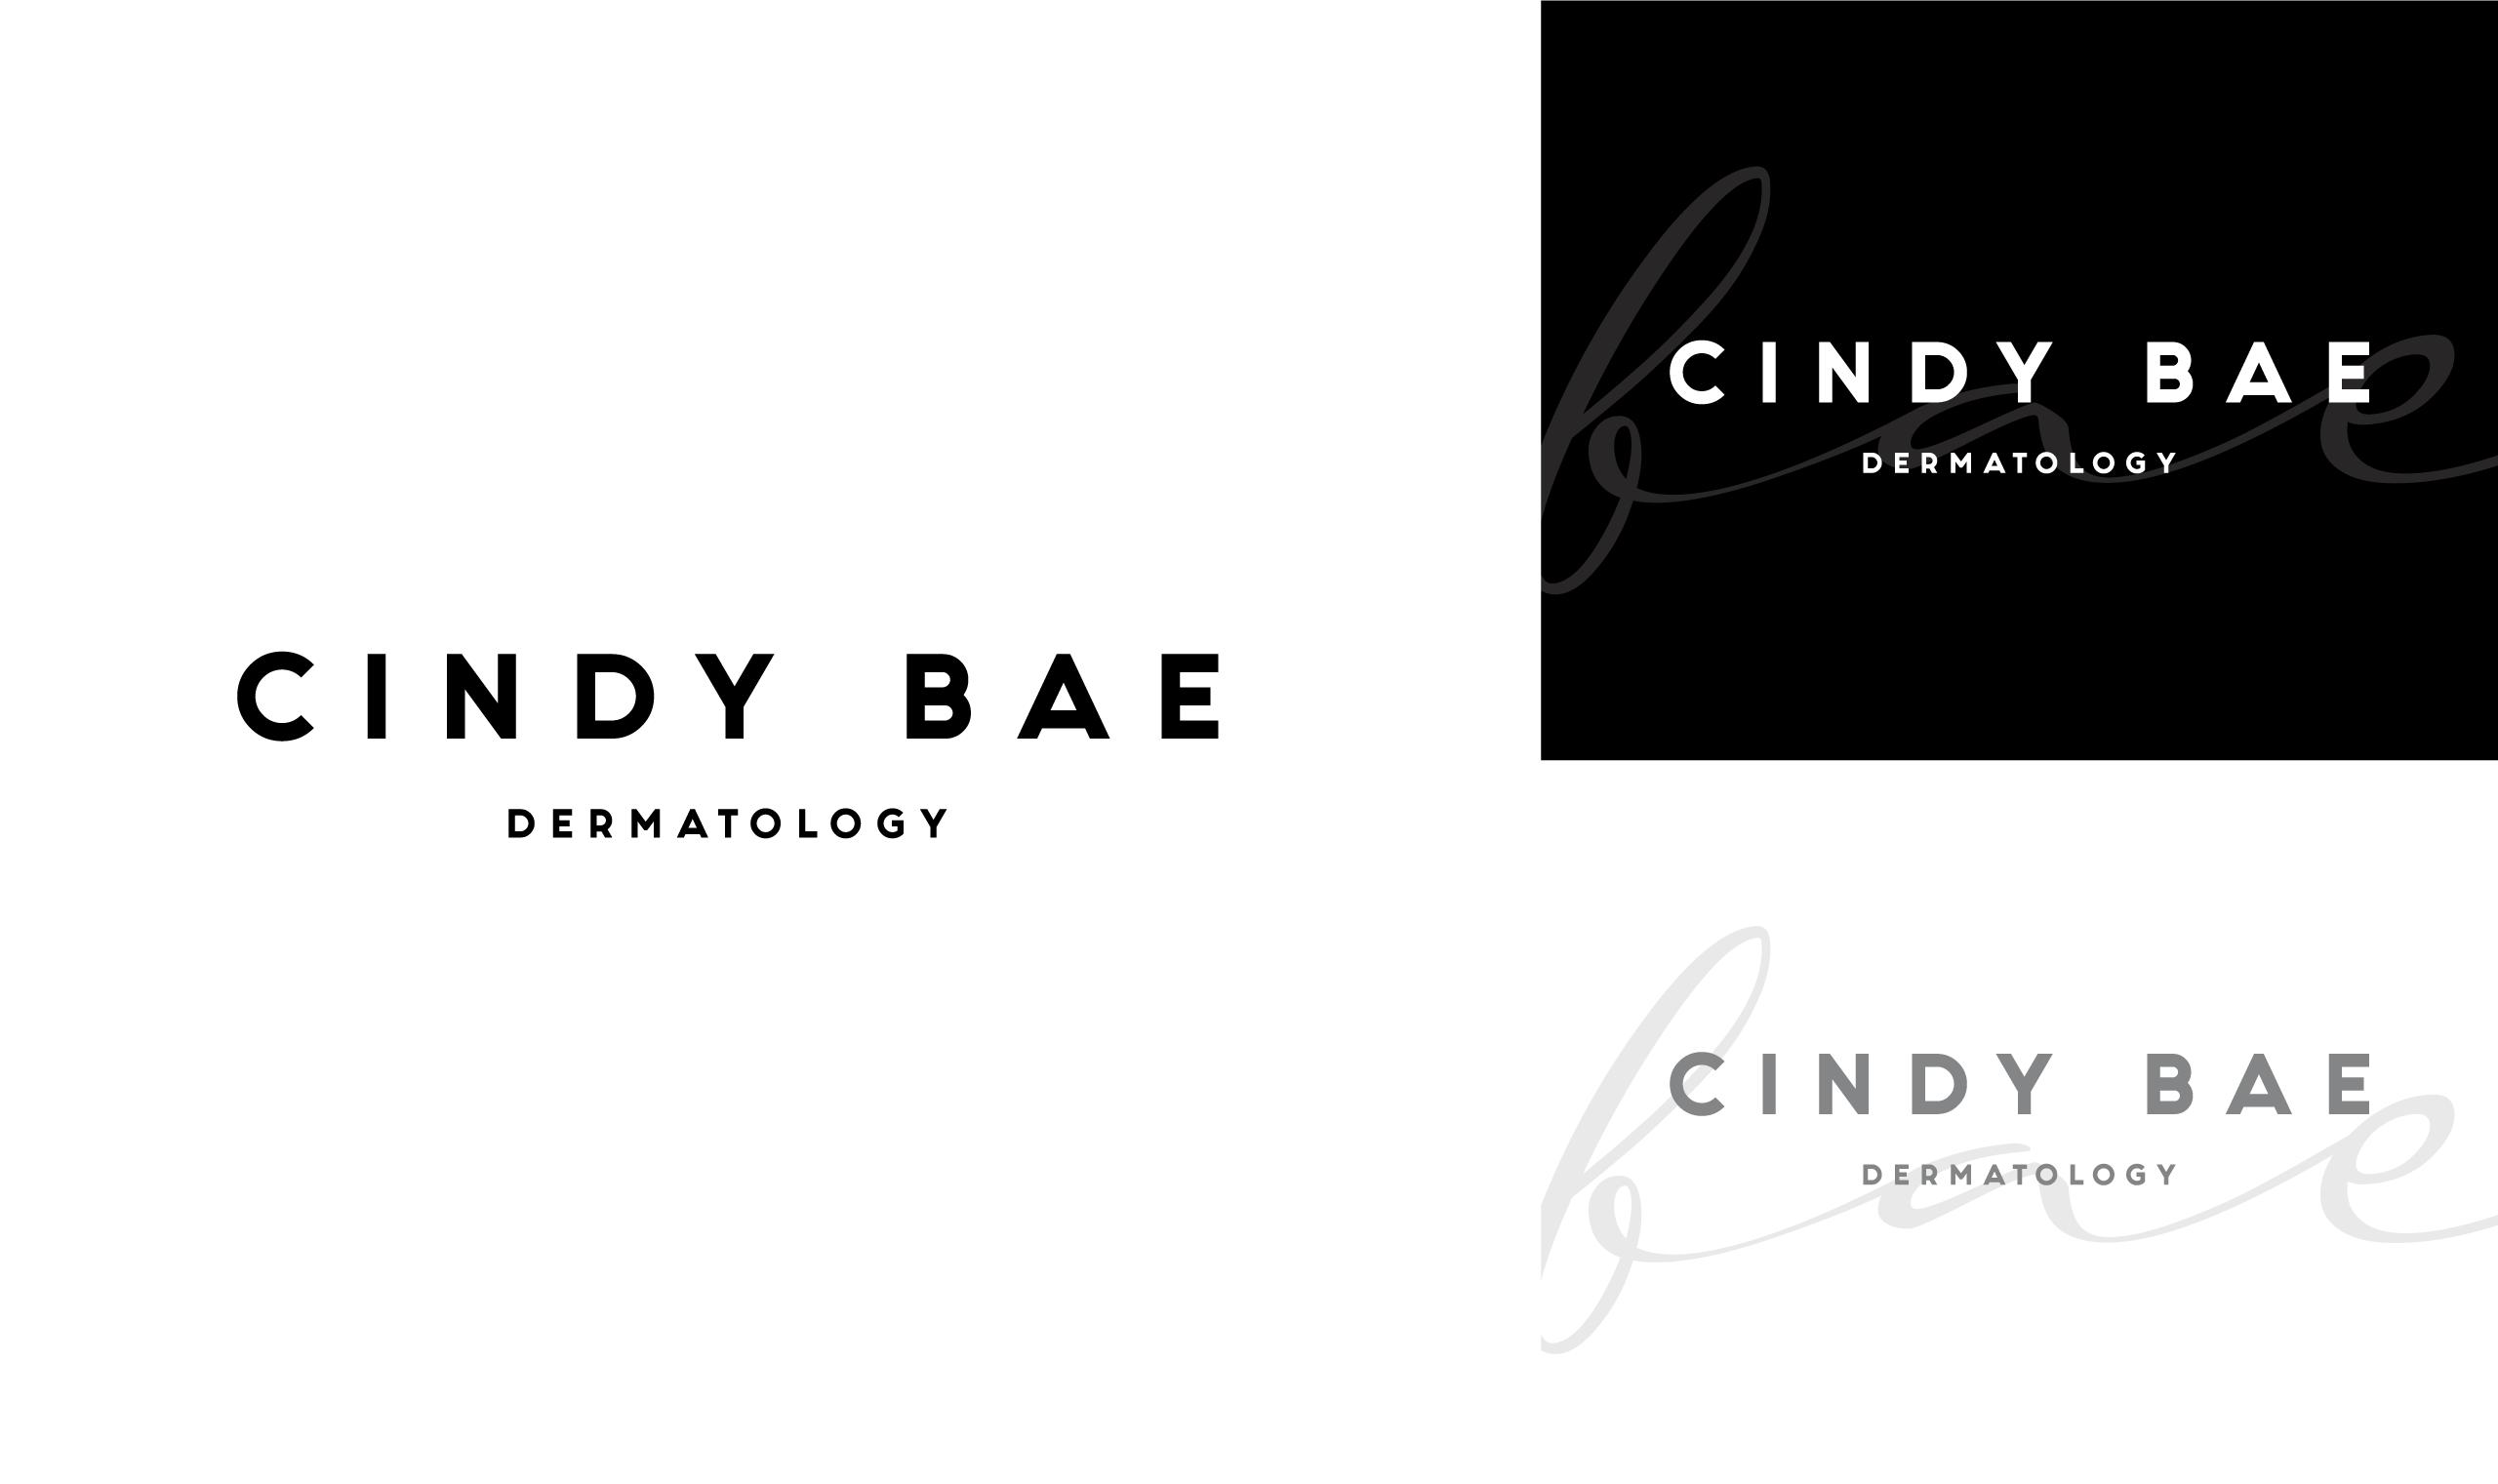 Cindy Bae